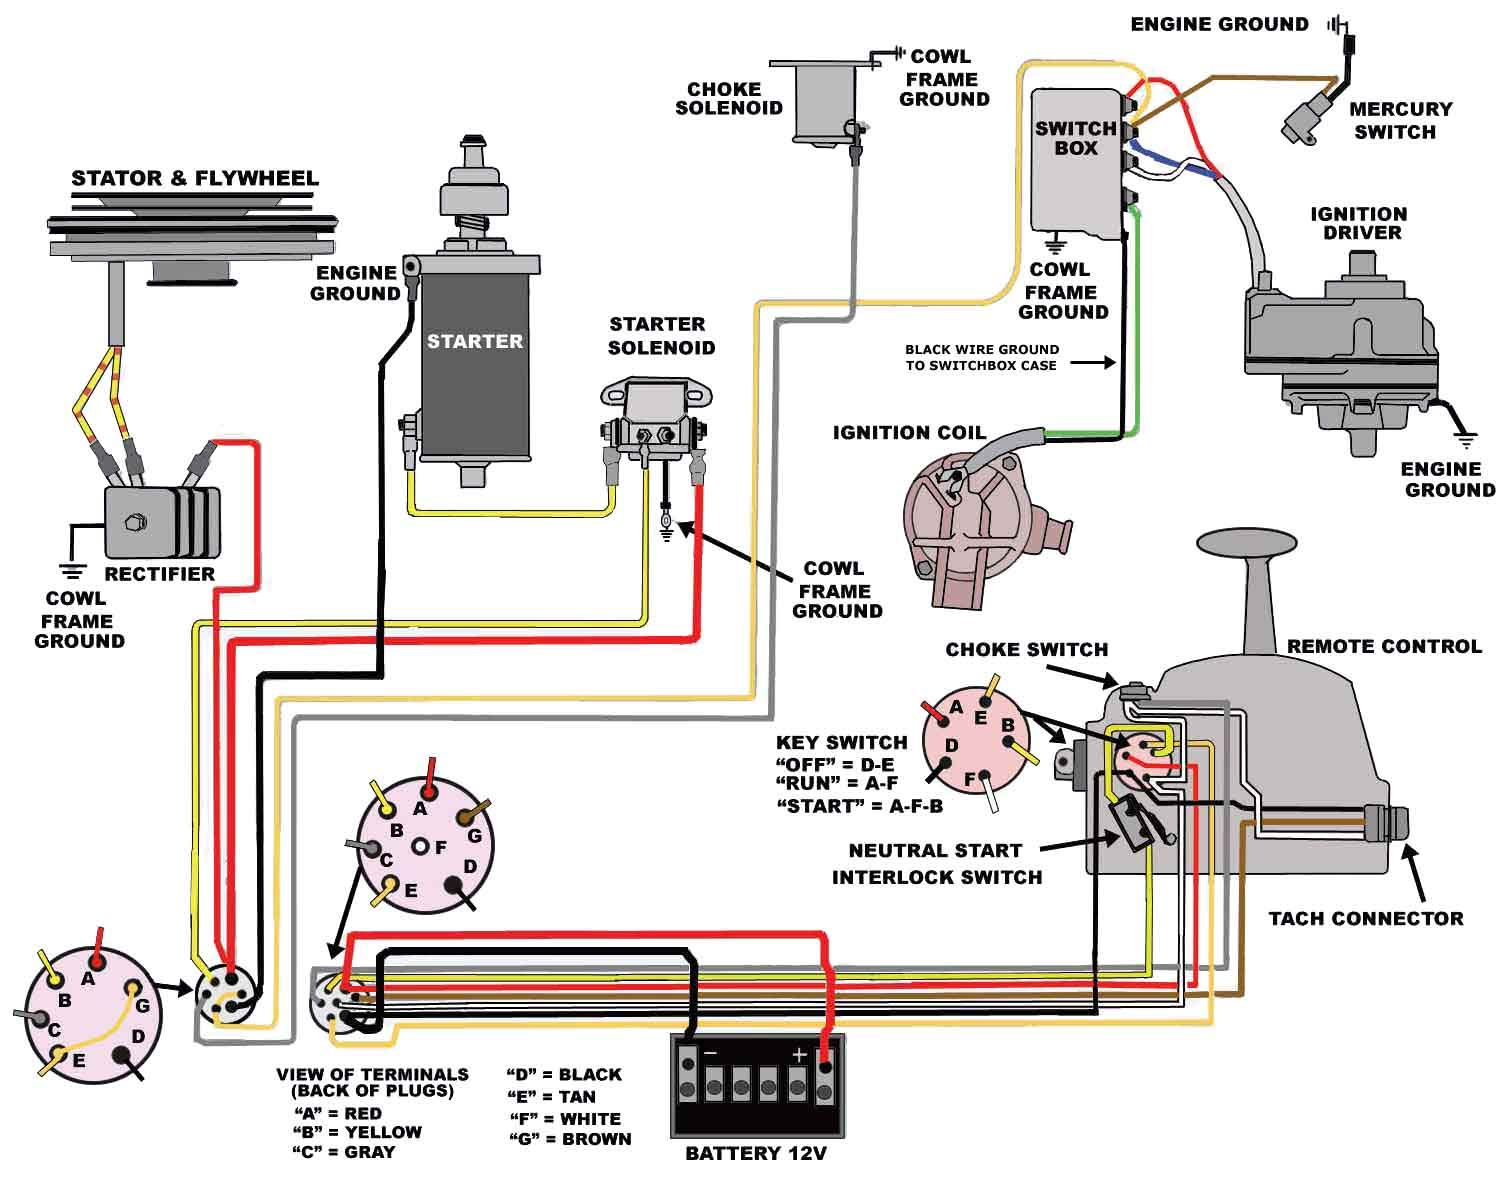 Mercury Outboard Wiring Diagram Diagram Pinterest Mercury